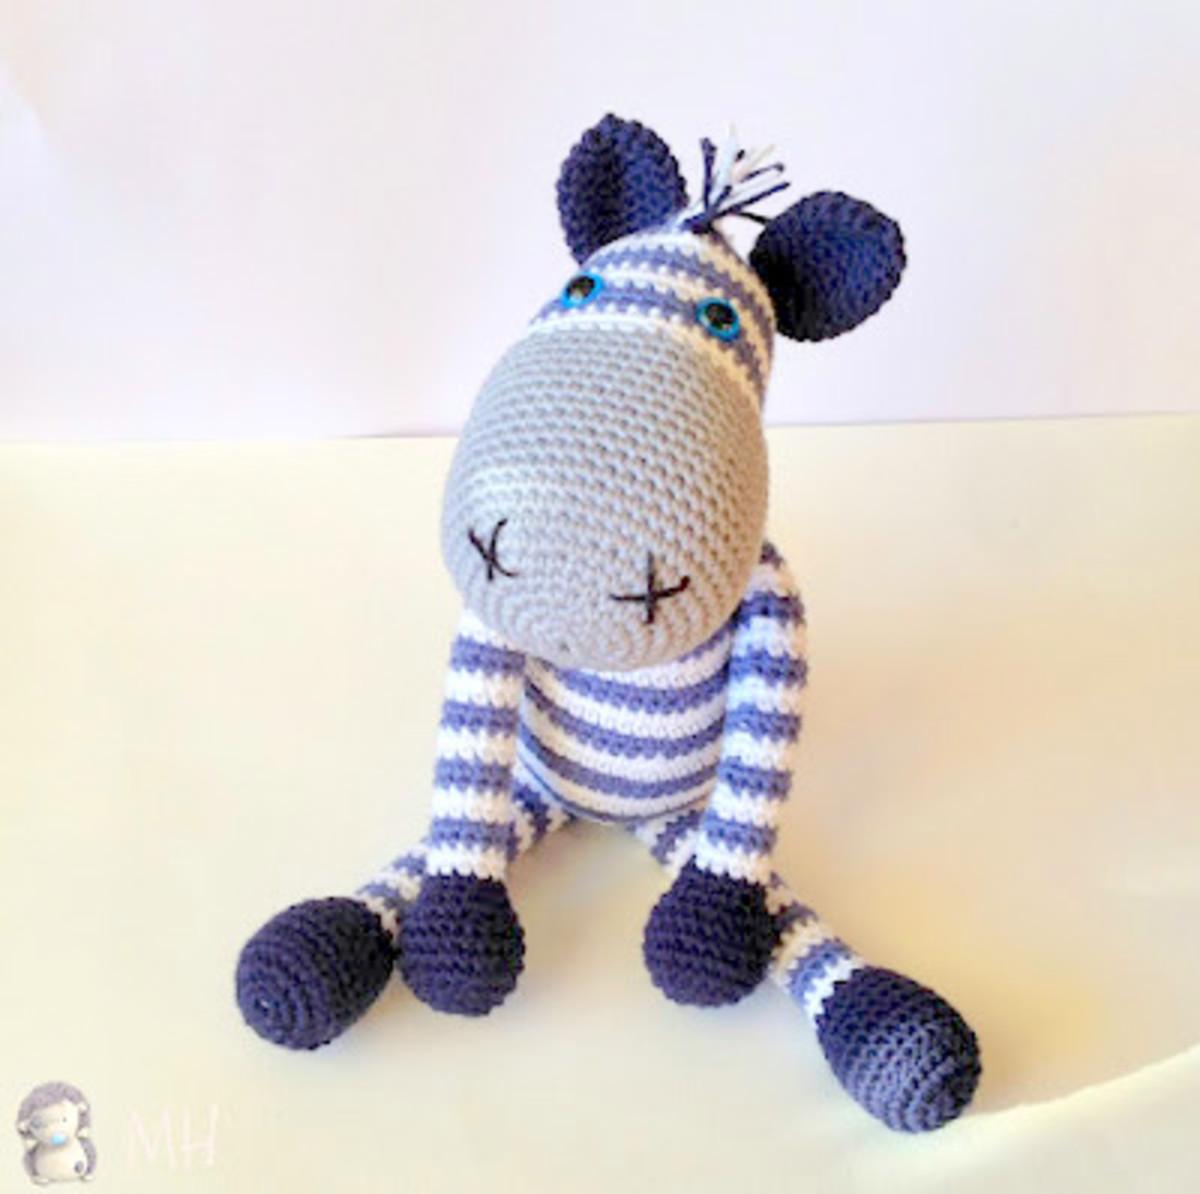 Zebra Amigurumi Doll: Free Crochet Pattern!